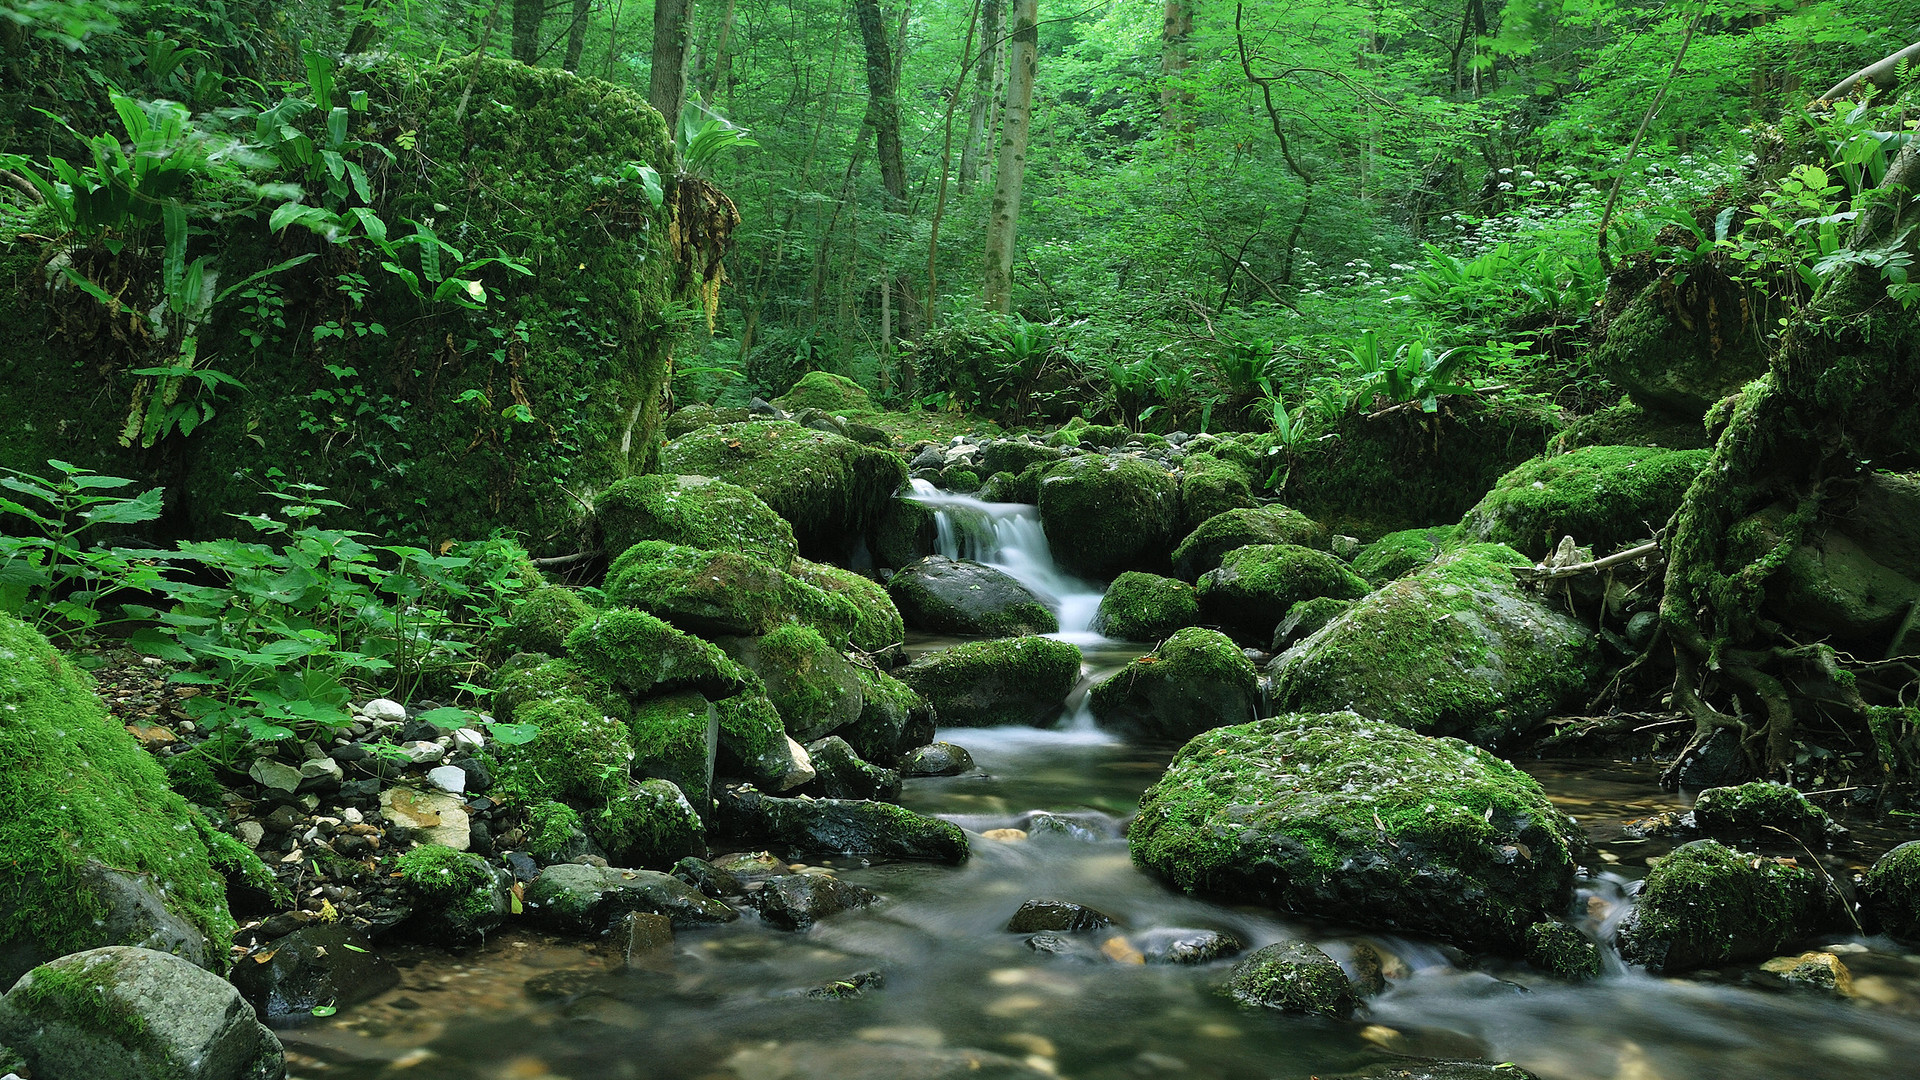 Wallpaper Download Wonderful landscapes – places to dream.  Beautiful Nature Landscapes Desktop Wallpapers.